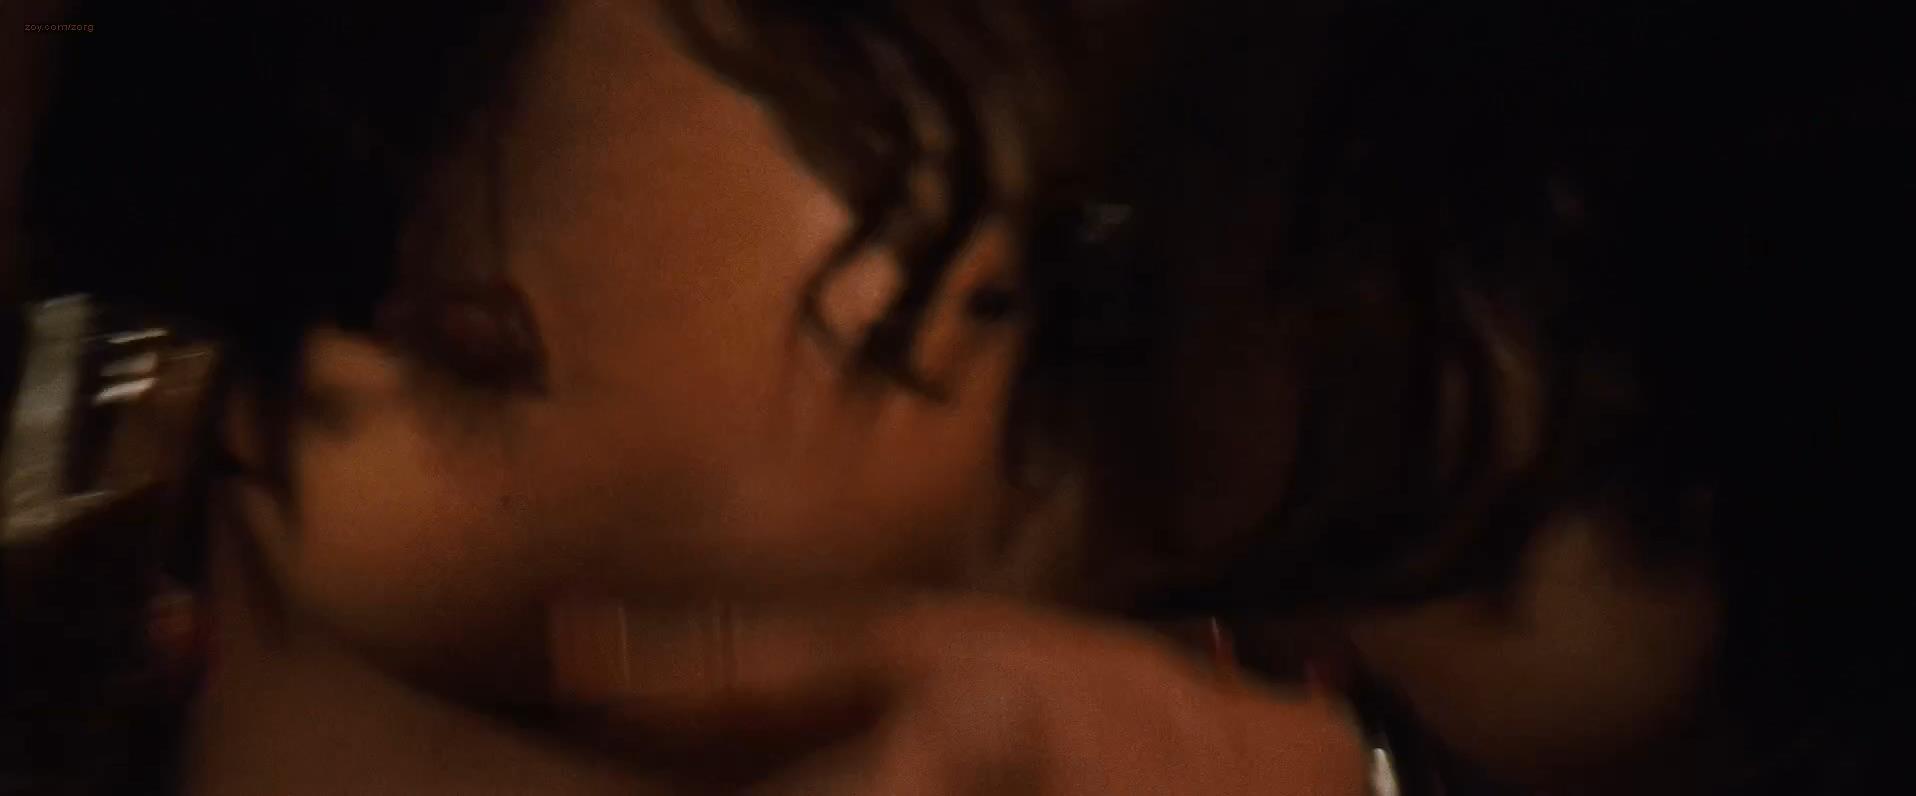 Paula Patton Nude Topless And Hot While Riding Denzel Washington - 2 -5767